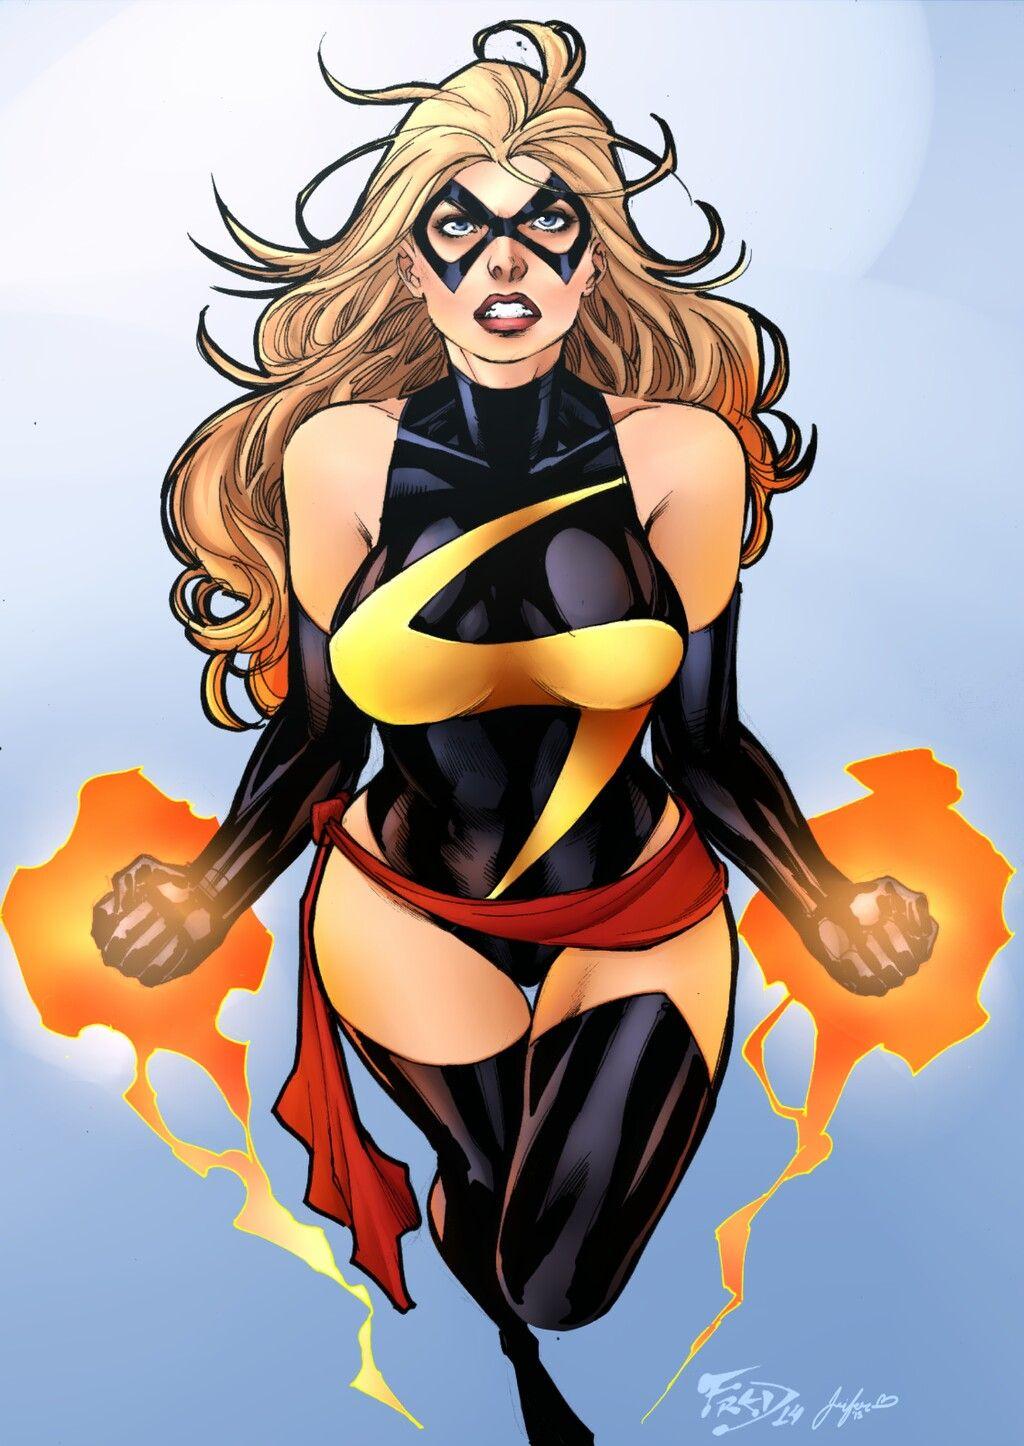 Marvel Carol danvers ms